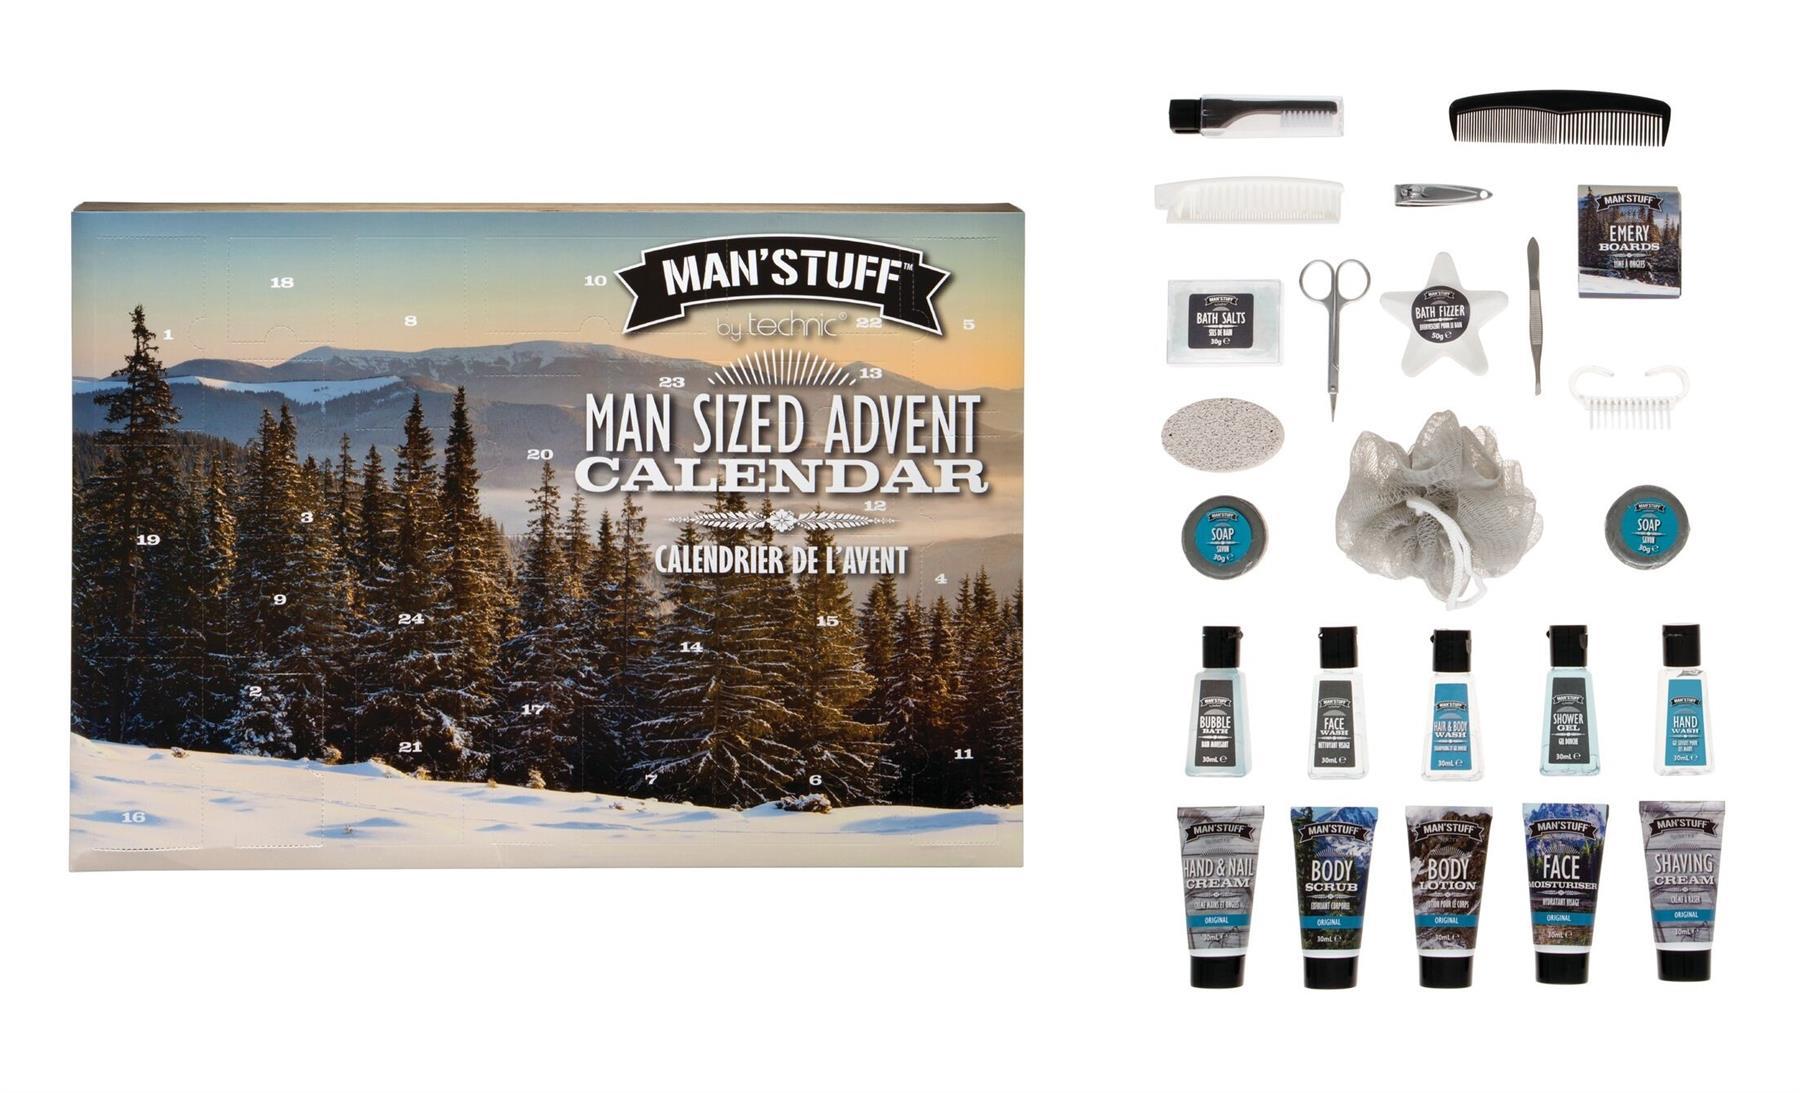 Technic-Men-Stuff-Toiletry-Gift-Sets-Christmas-Advent-Calendar thumbnail 9